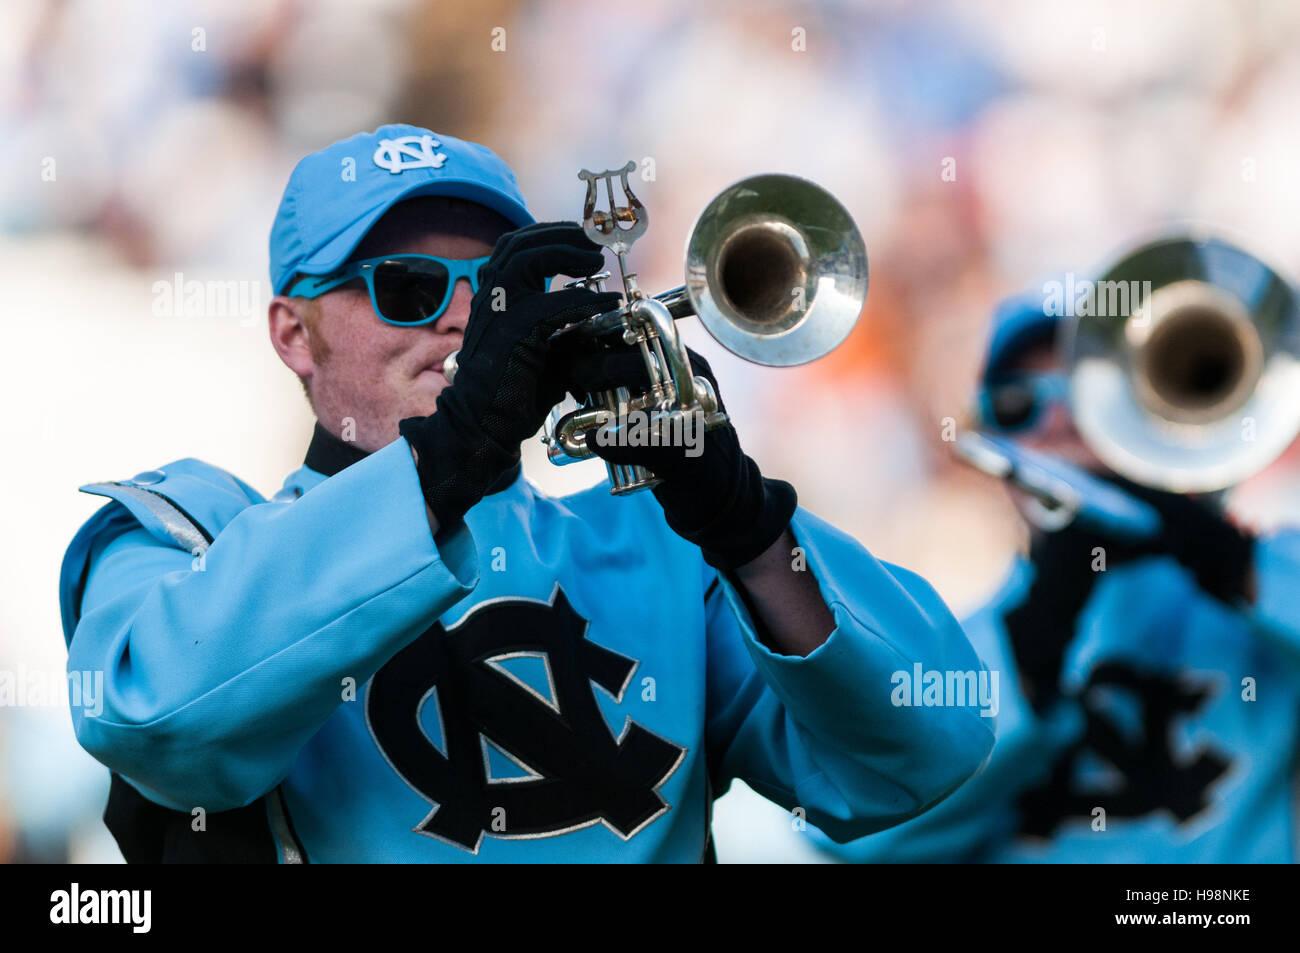 Chapel Hill, North Carolina, US. 19th Nov, 2016. Nov. 19, 2016 - Chapel Hill, N.C., USA - The University of North Stock Photo